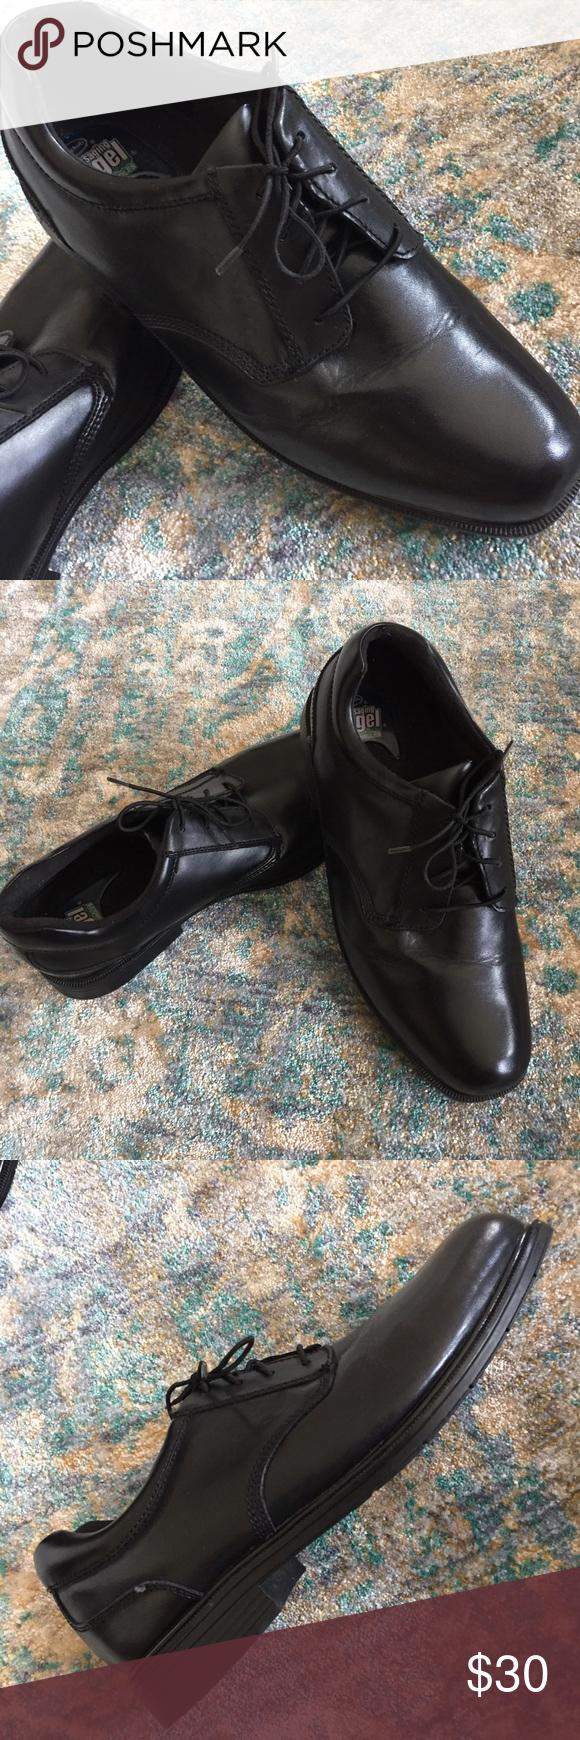 Ltx Men S Work Shoe Black Work Shoes Work Shoes Mens Work Shoes [ 1740 x 580 Pixel ]